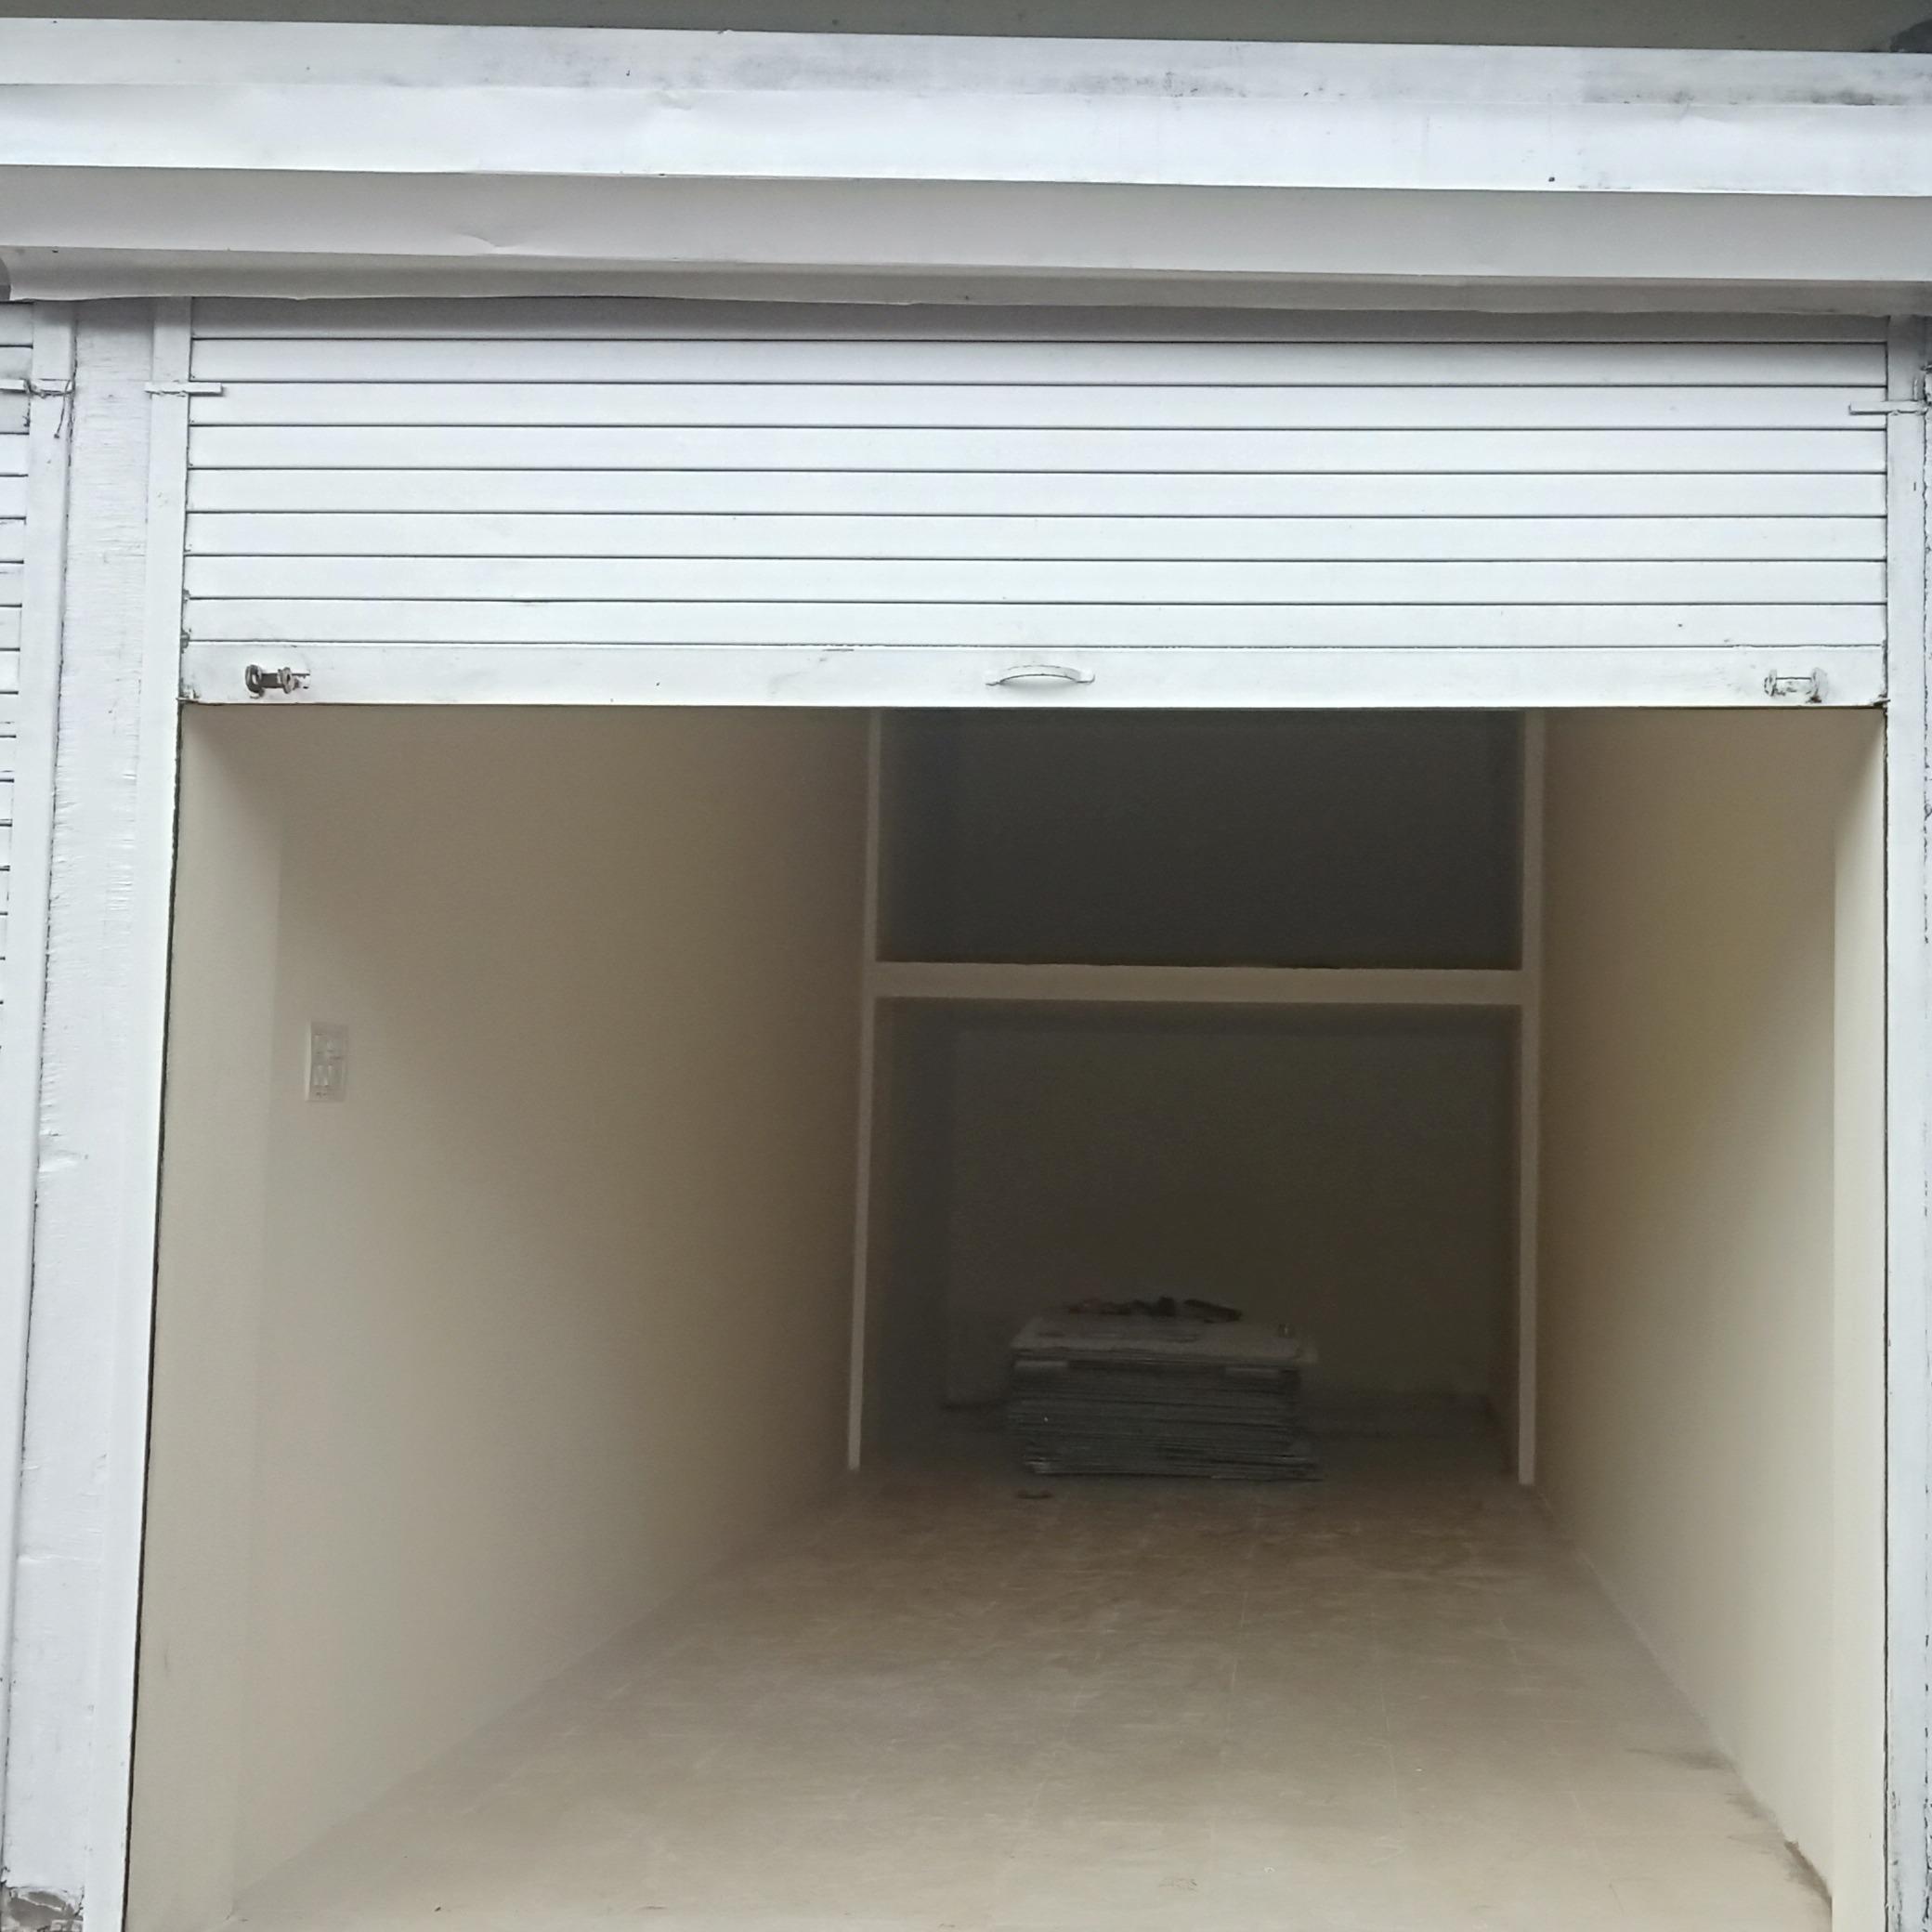 750 Sq.Ft. Retail Shop in Kharghar Sector 18